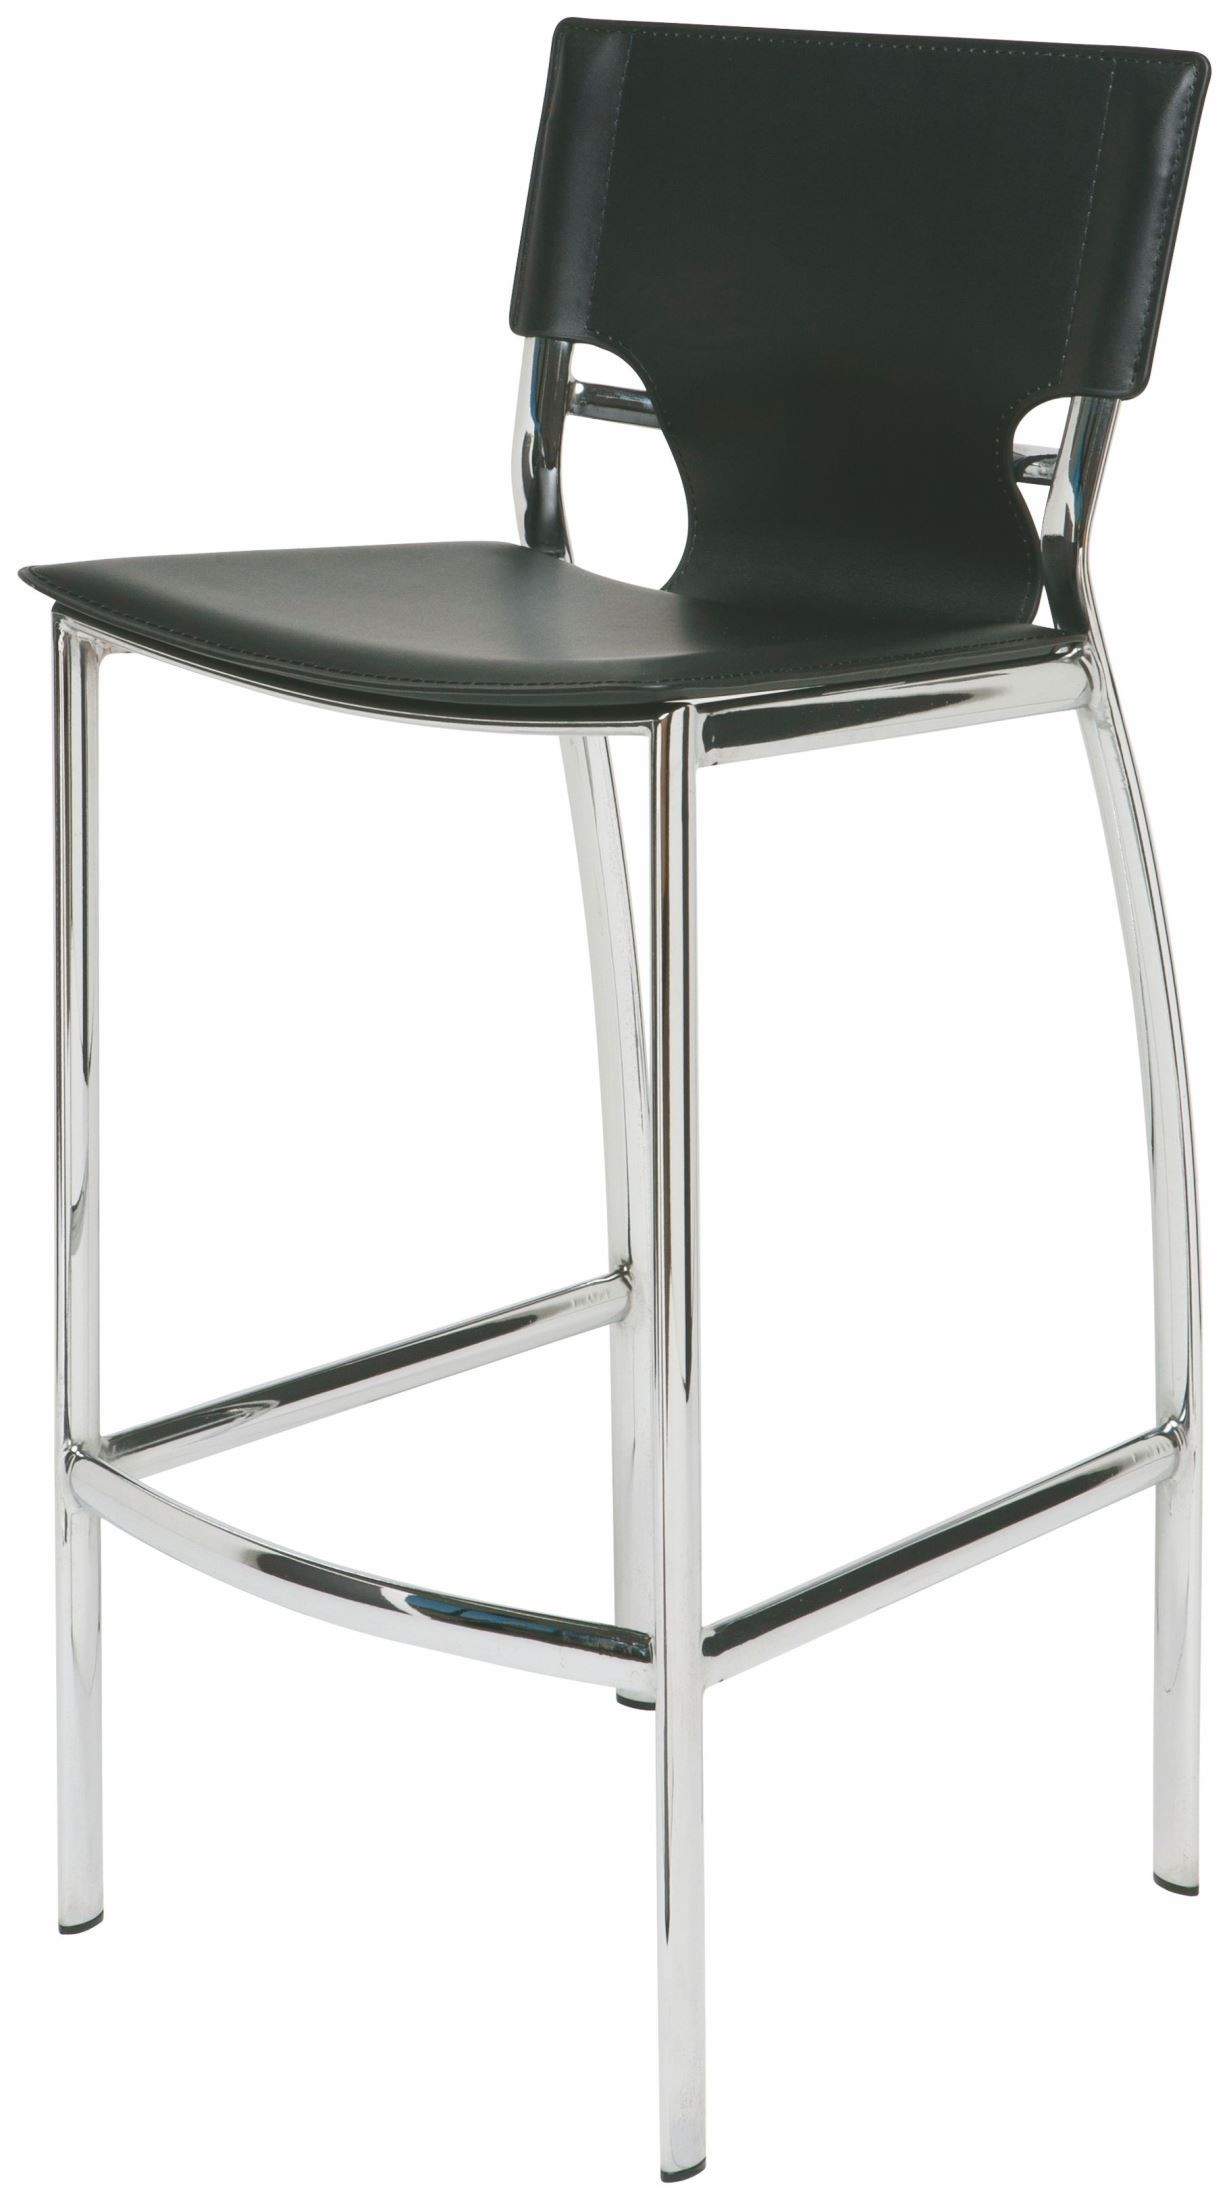 Lisbon Black Leather Bar Stool From Nuevo Coleman Furniture